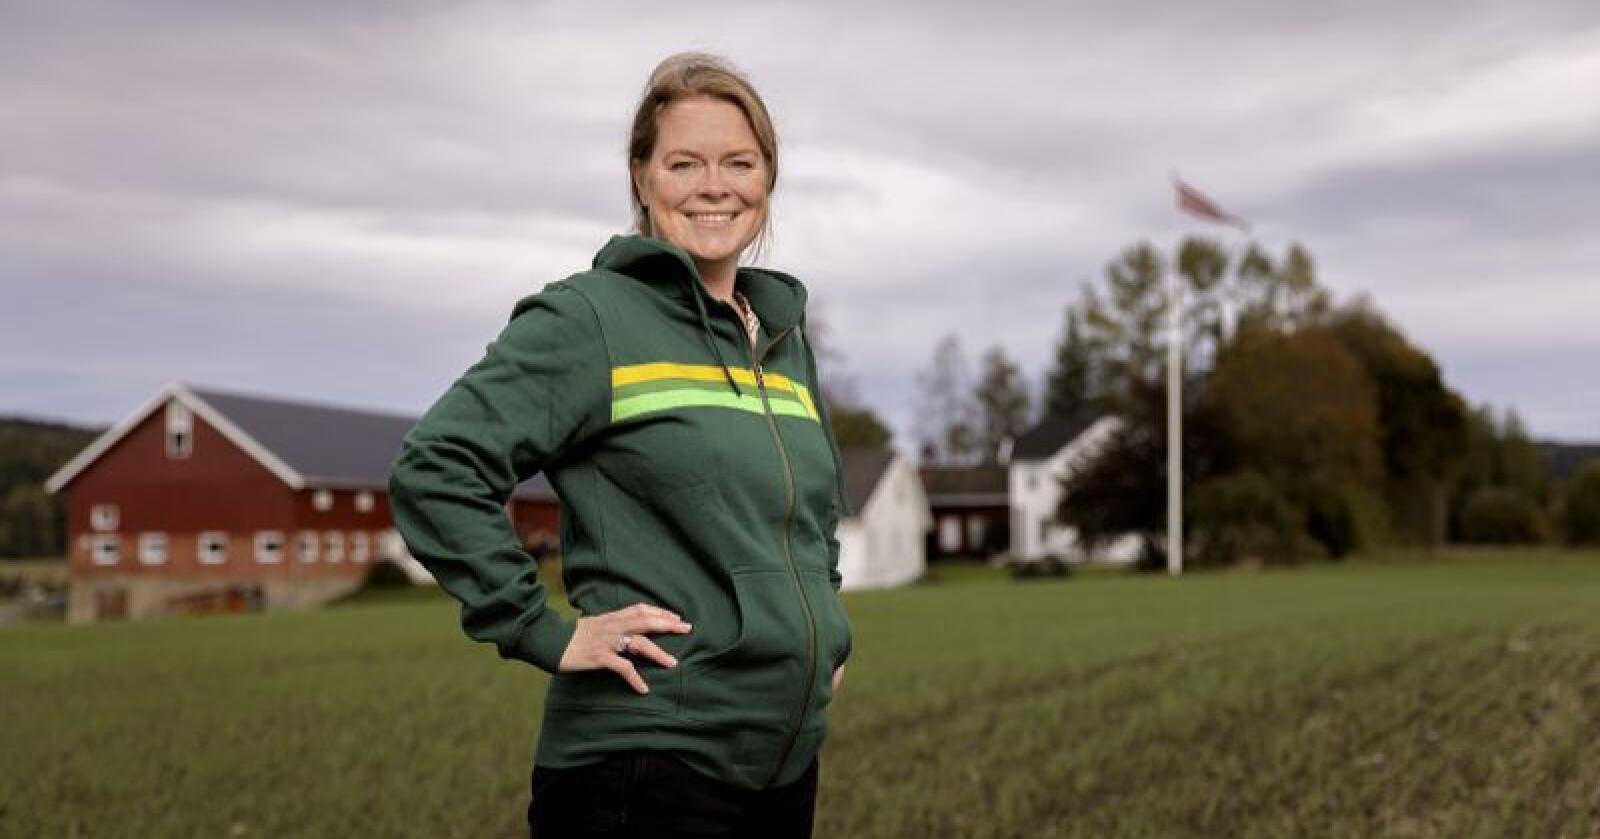 Anne Jødahl Skuterud ble valgt som styreleder første gang i 2016. (Arkivfoto: FK Agri)